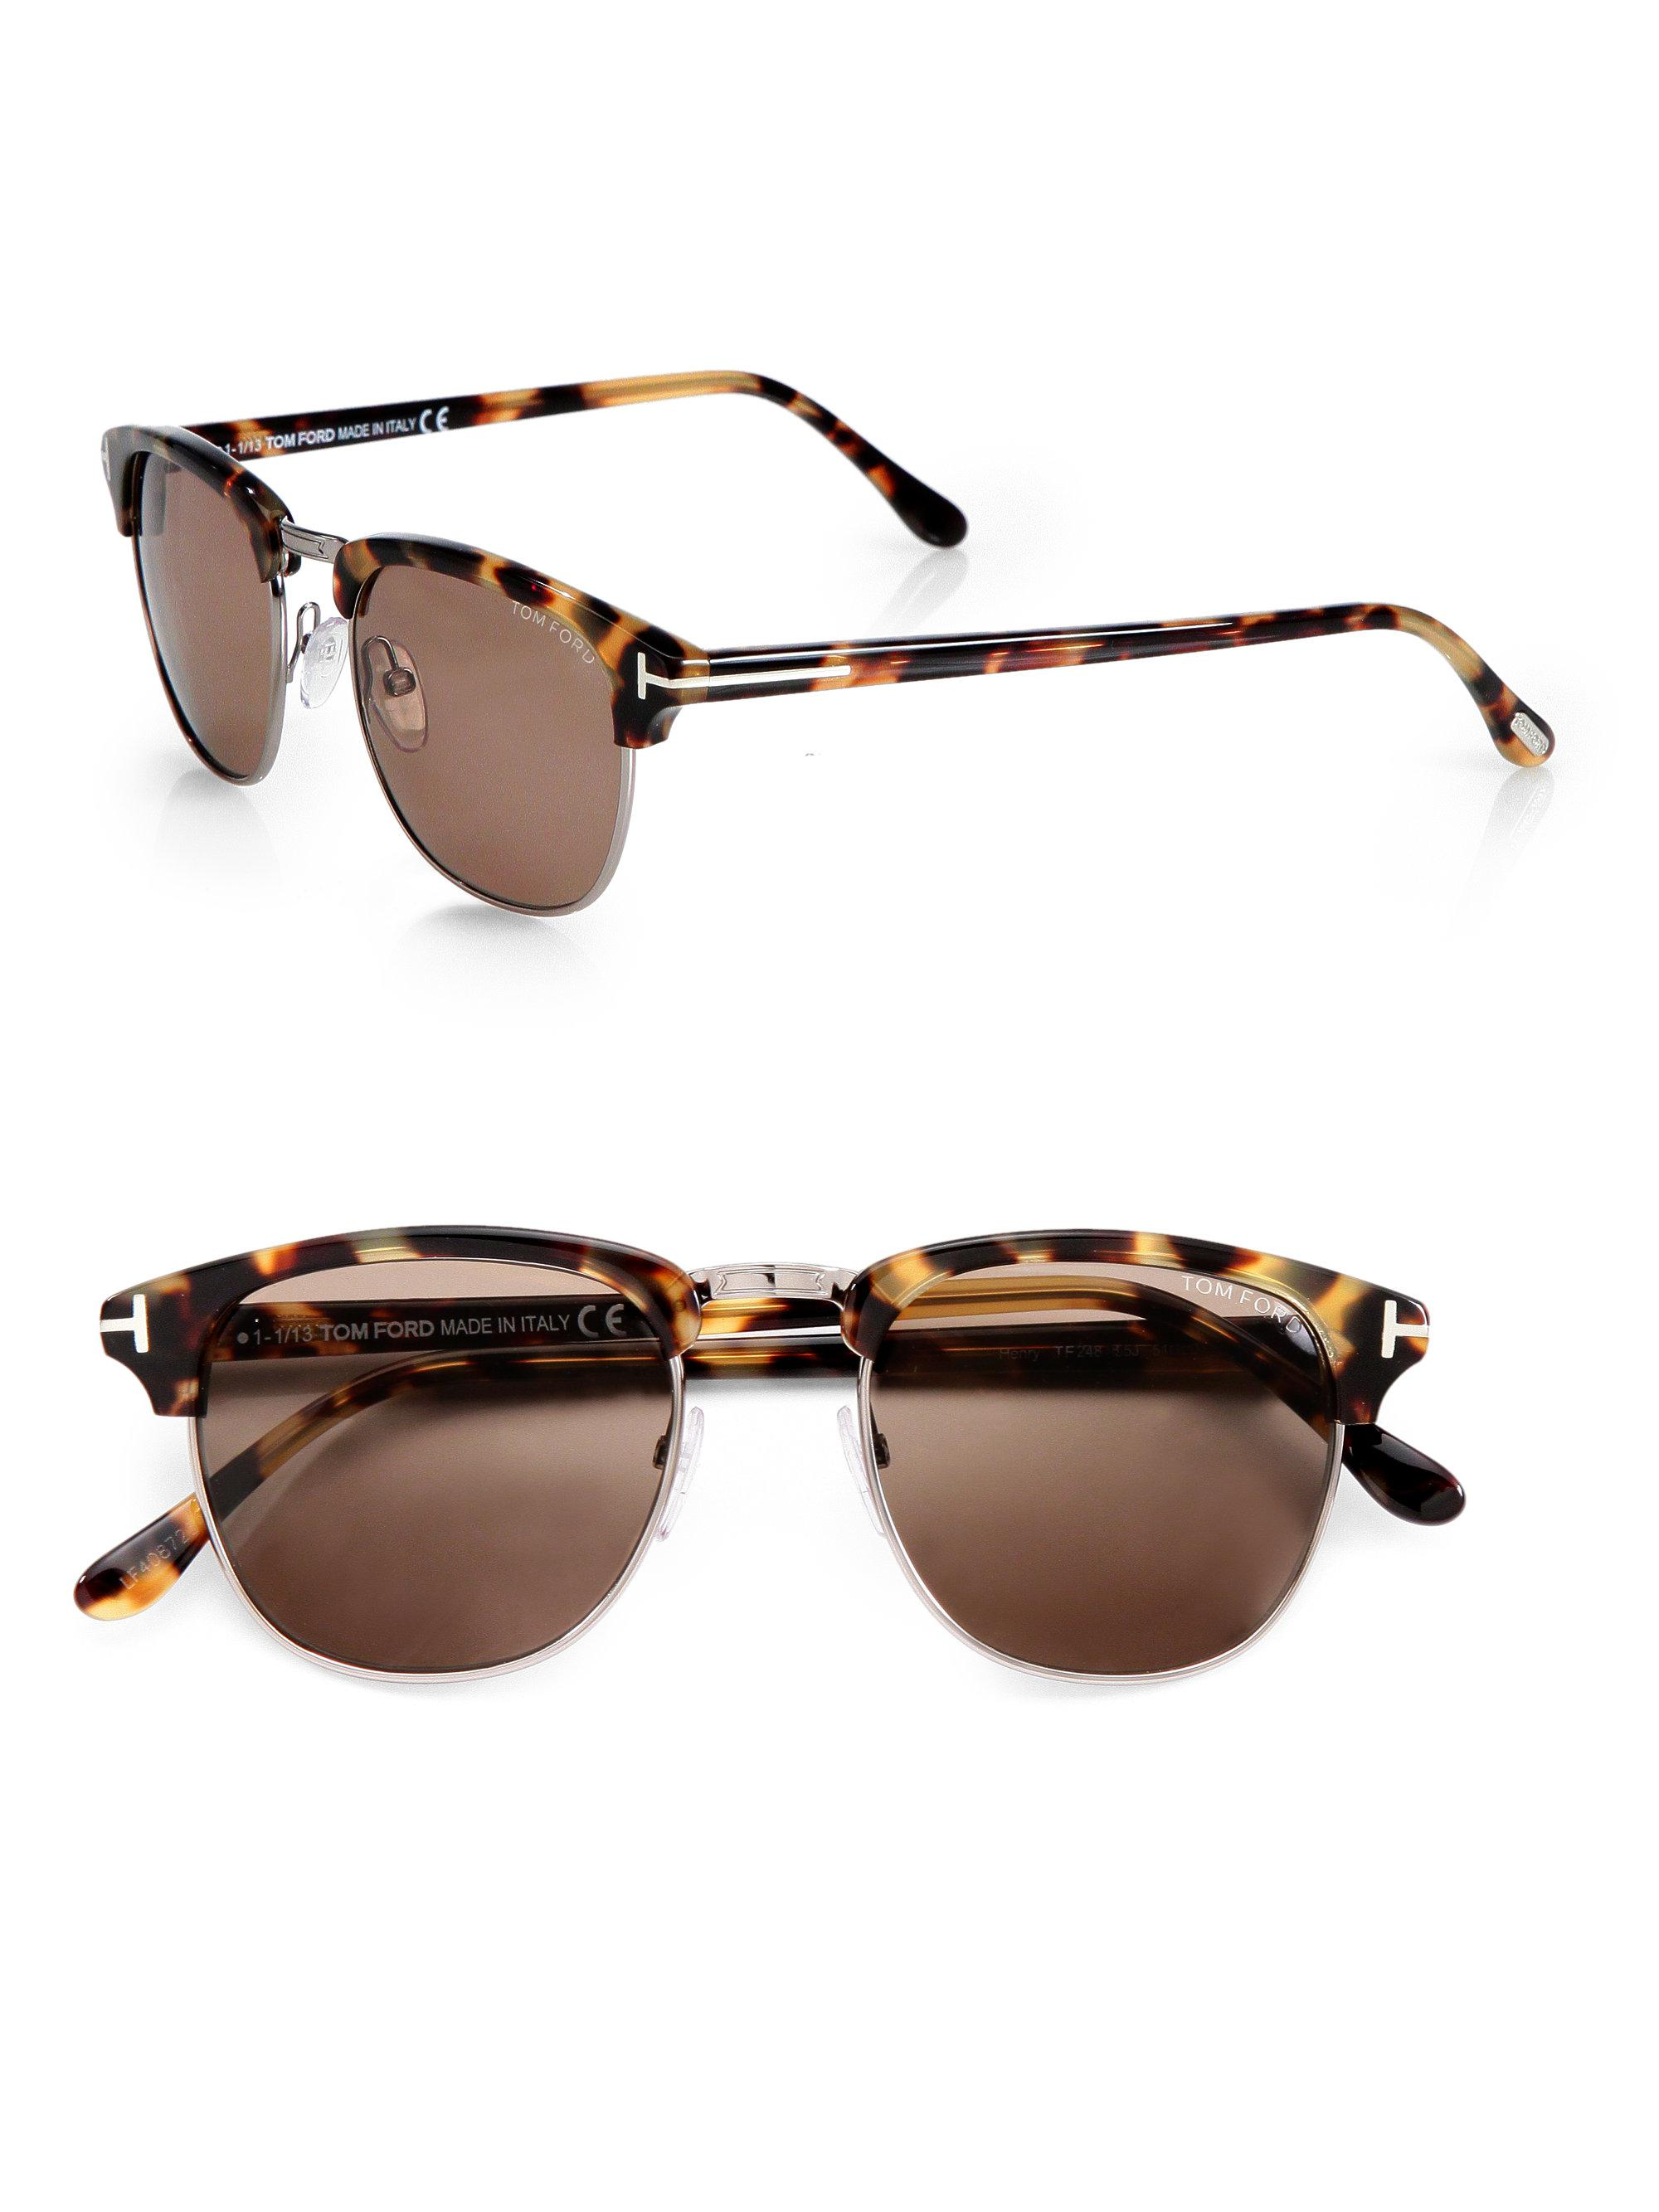 07f7de9c572 Lyst - Tom Ford Henry Retro Sunglasses in Brown for Men